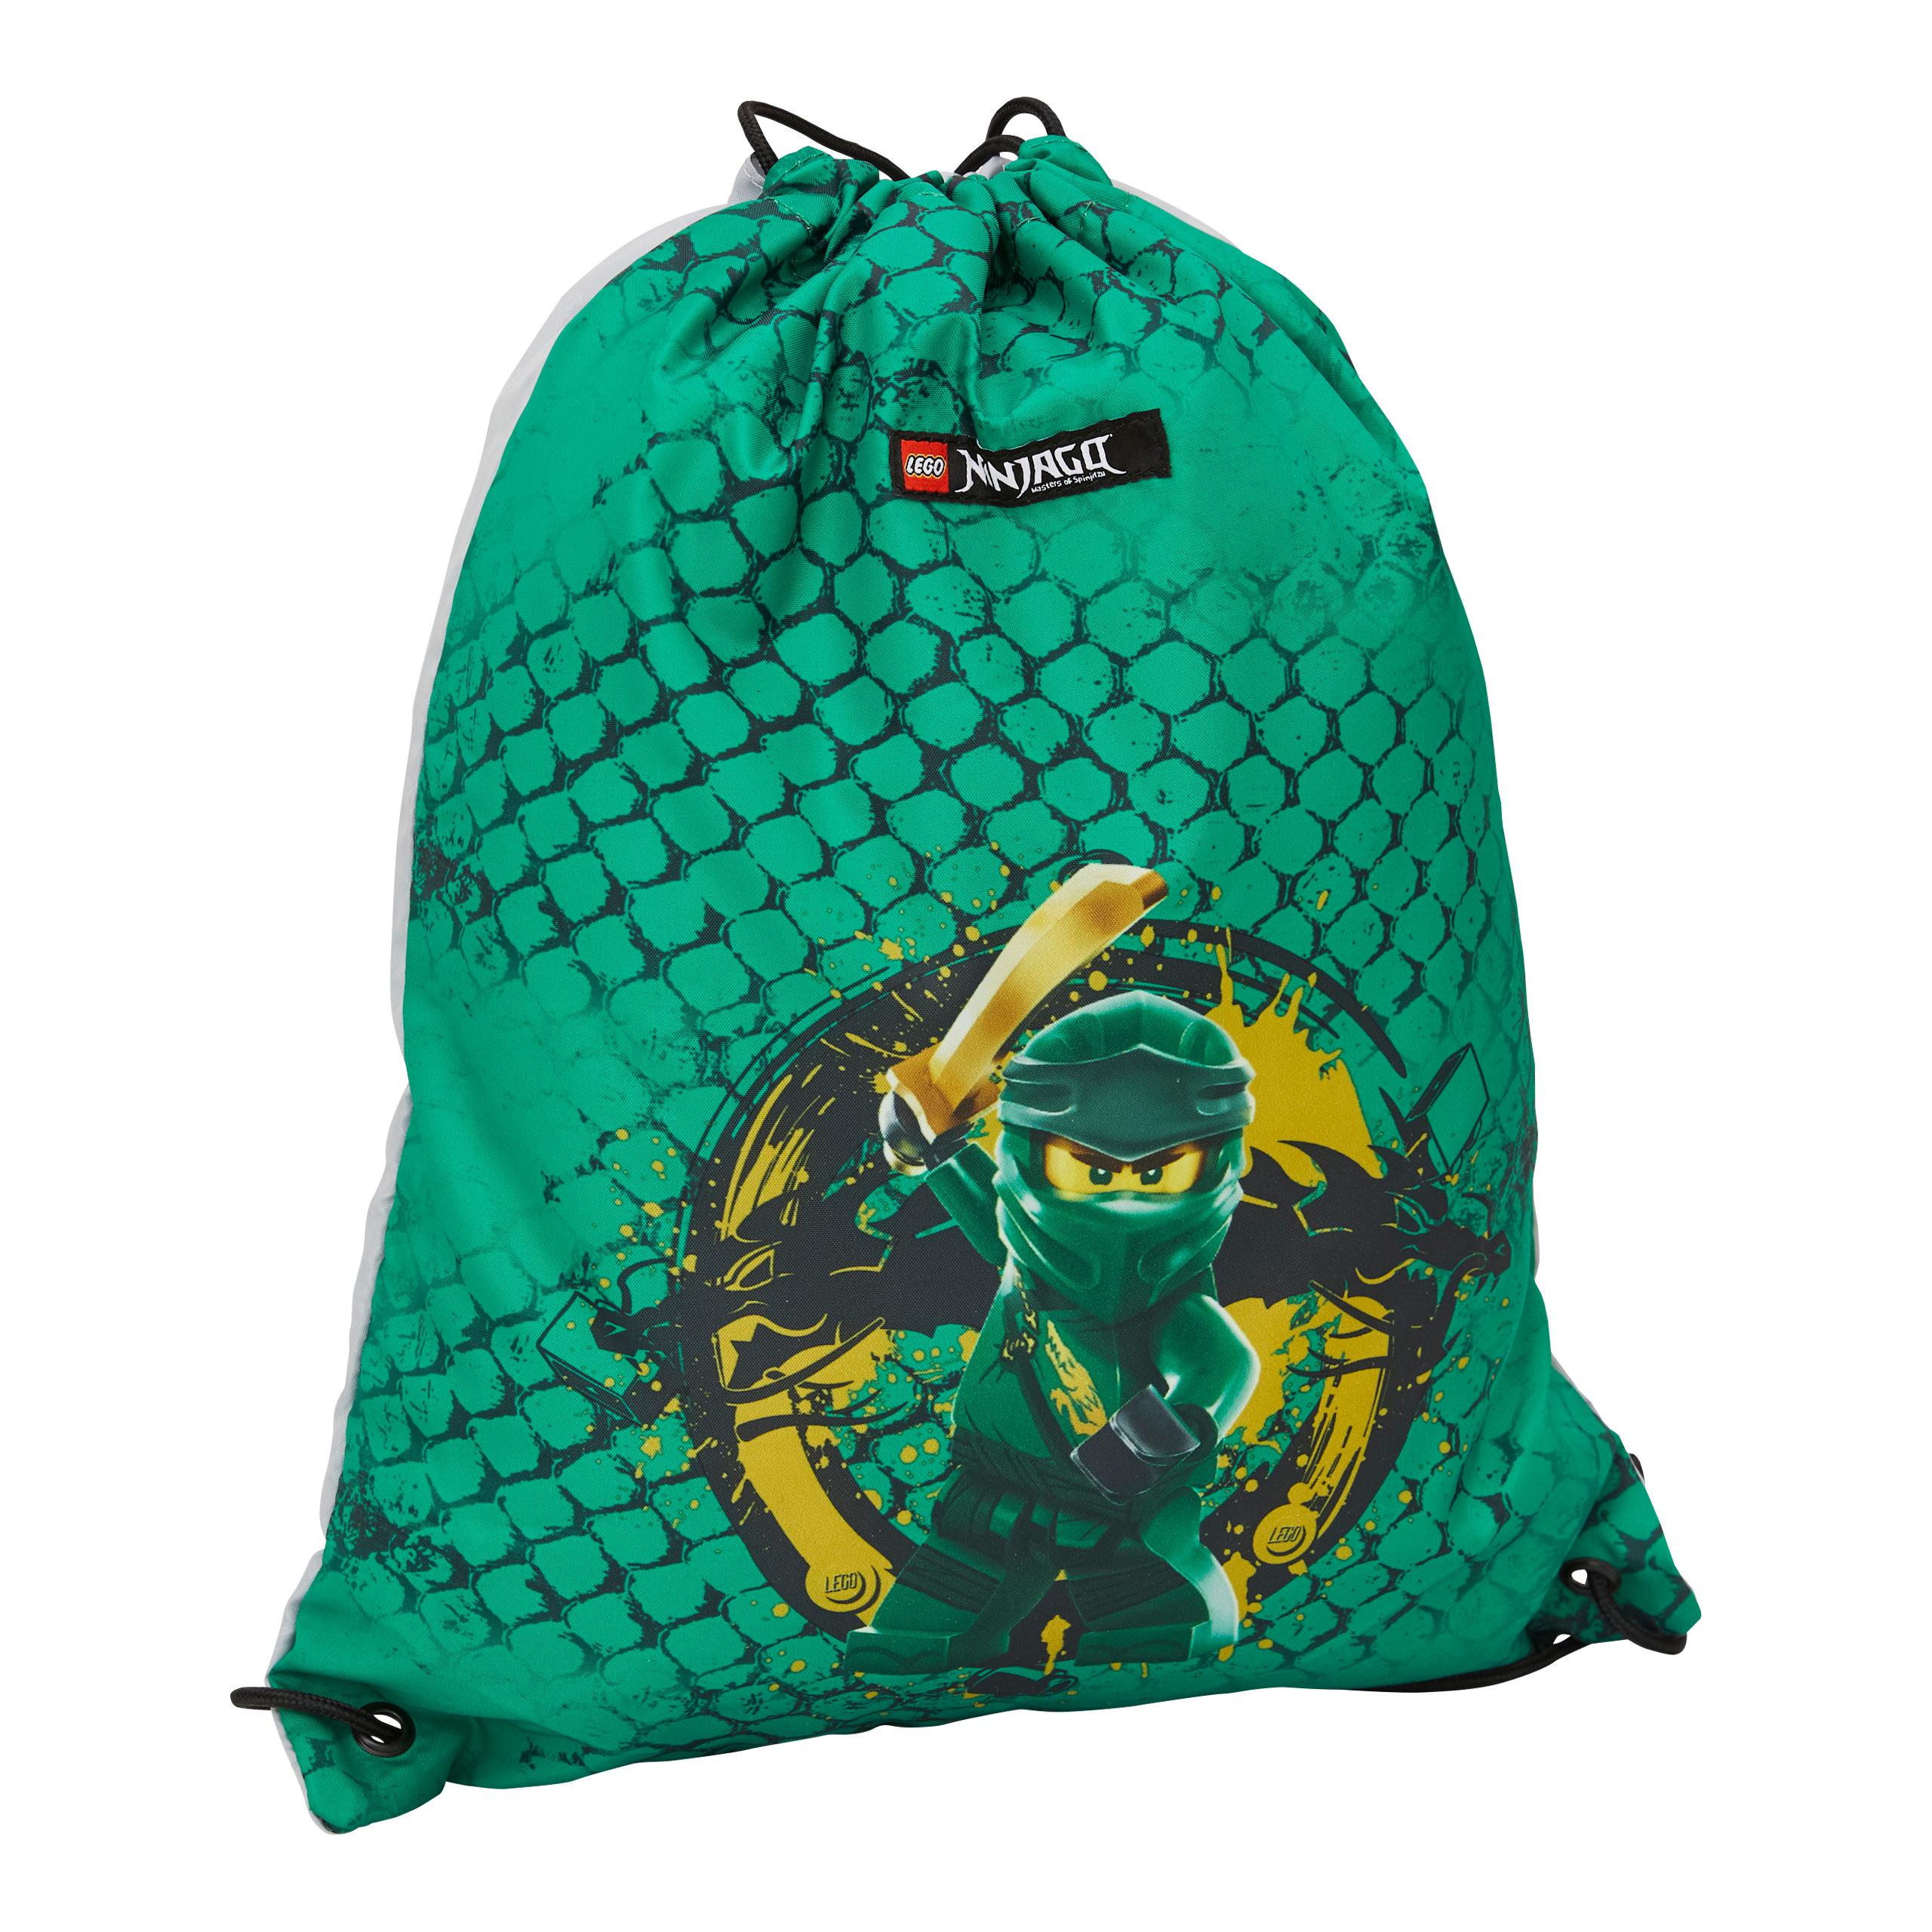 LEGO® BAGS ΣΑΚΙΔΙΟ ΜΕ ΚΟΡΔΟΝΙ: NINJAGO GREEN - 10034-2101